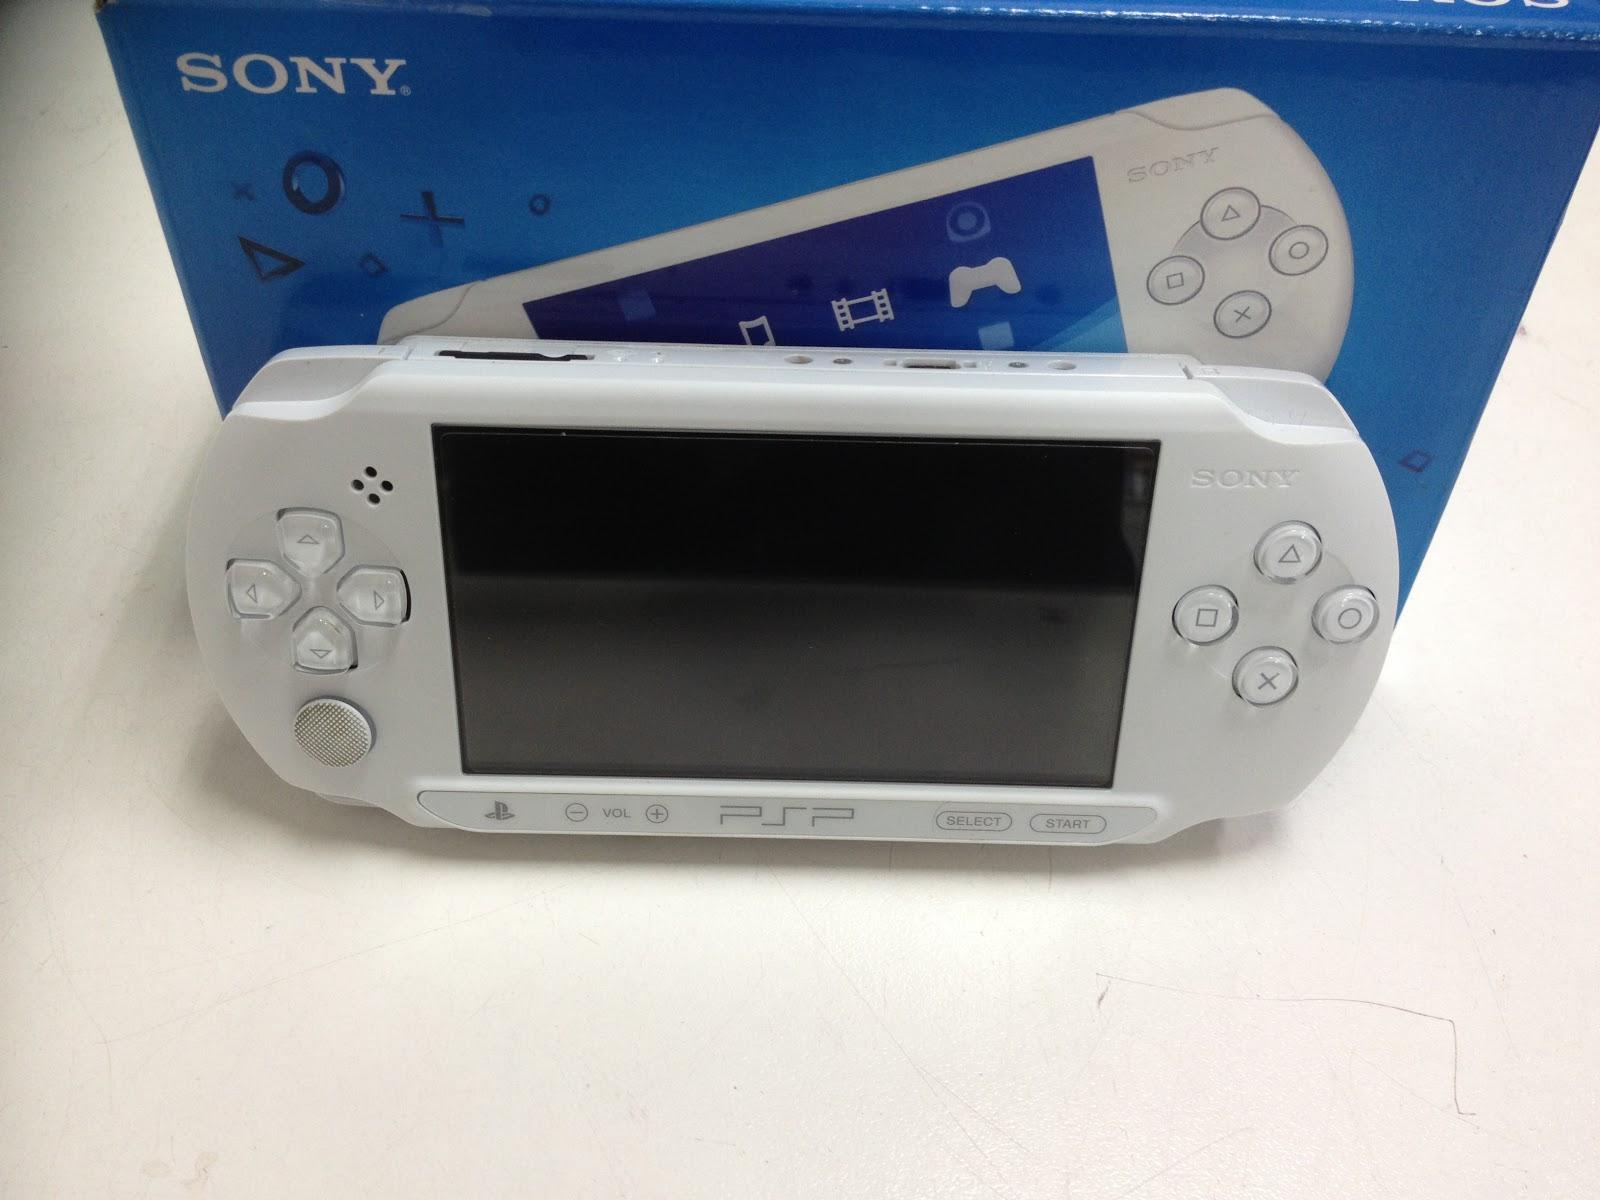 SONY PSP 1004 WHITE149 ONLY